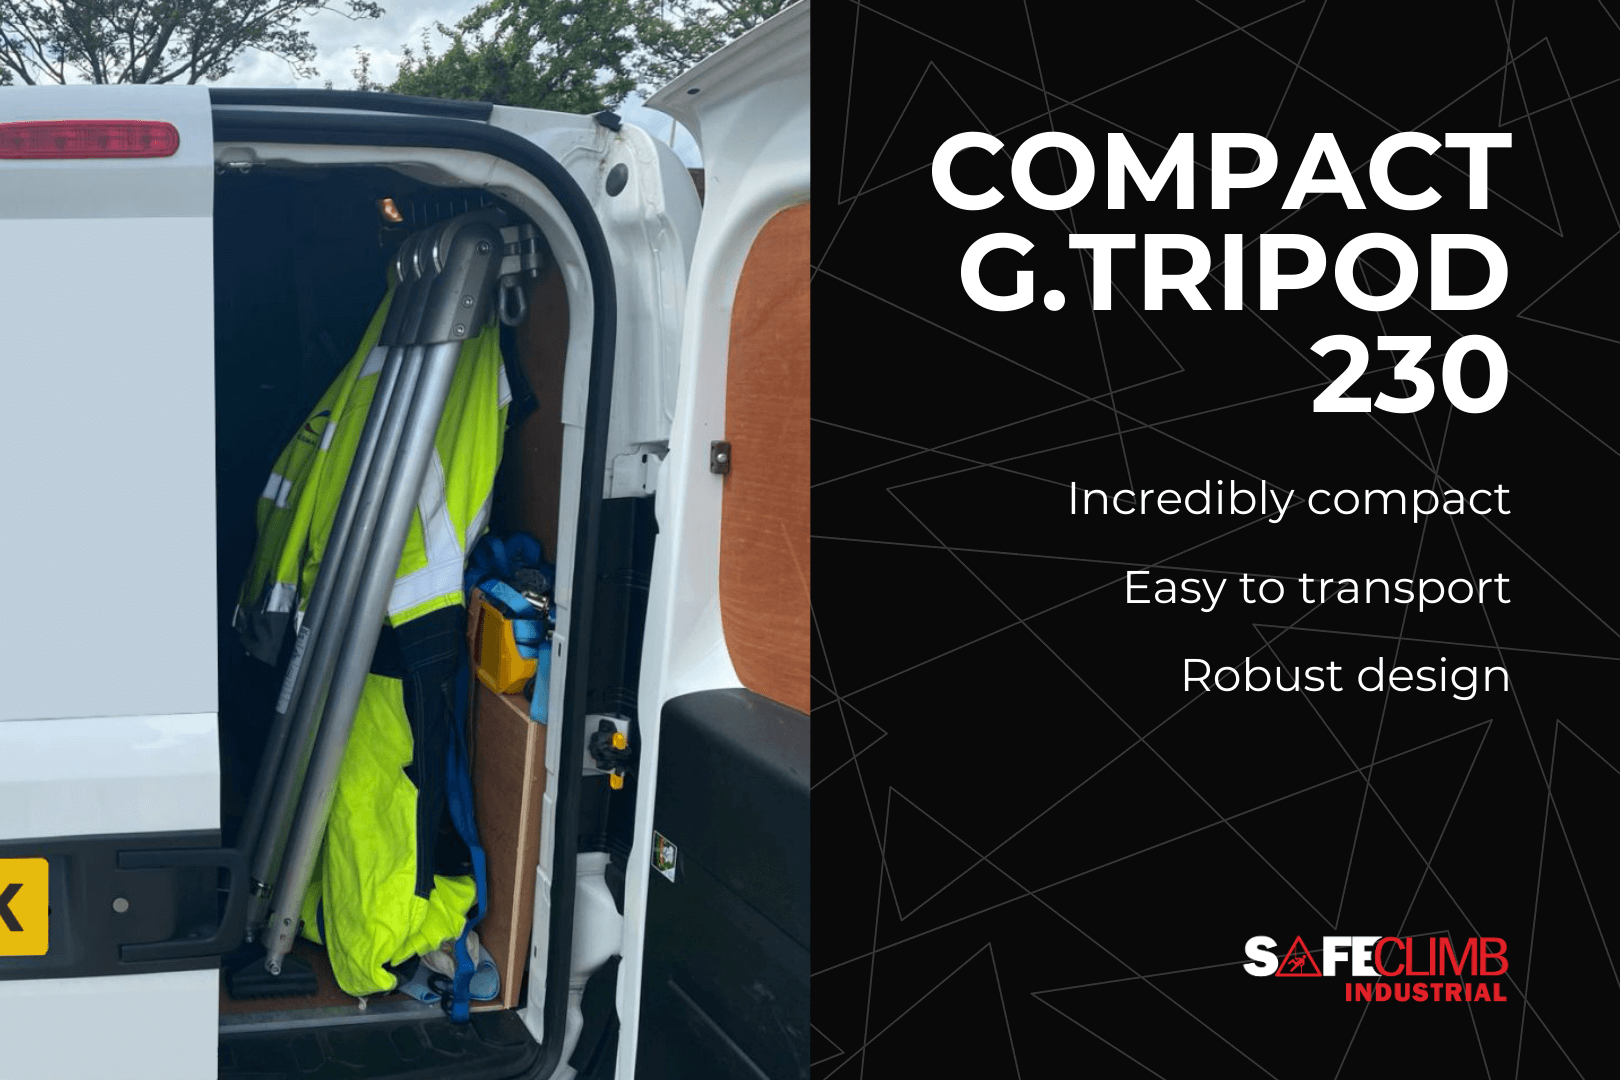 Compact G.Tripod-230 inside a van